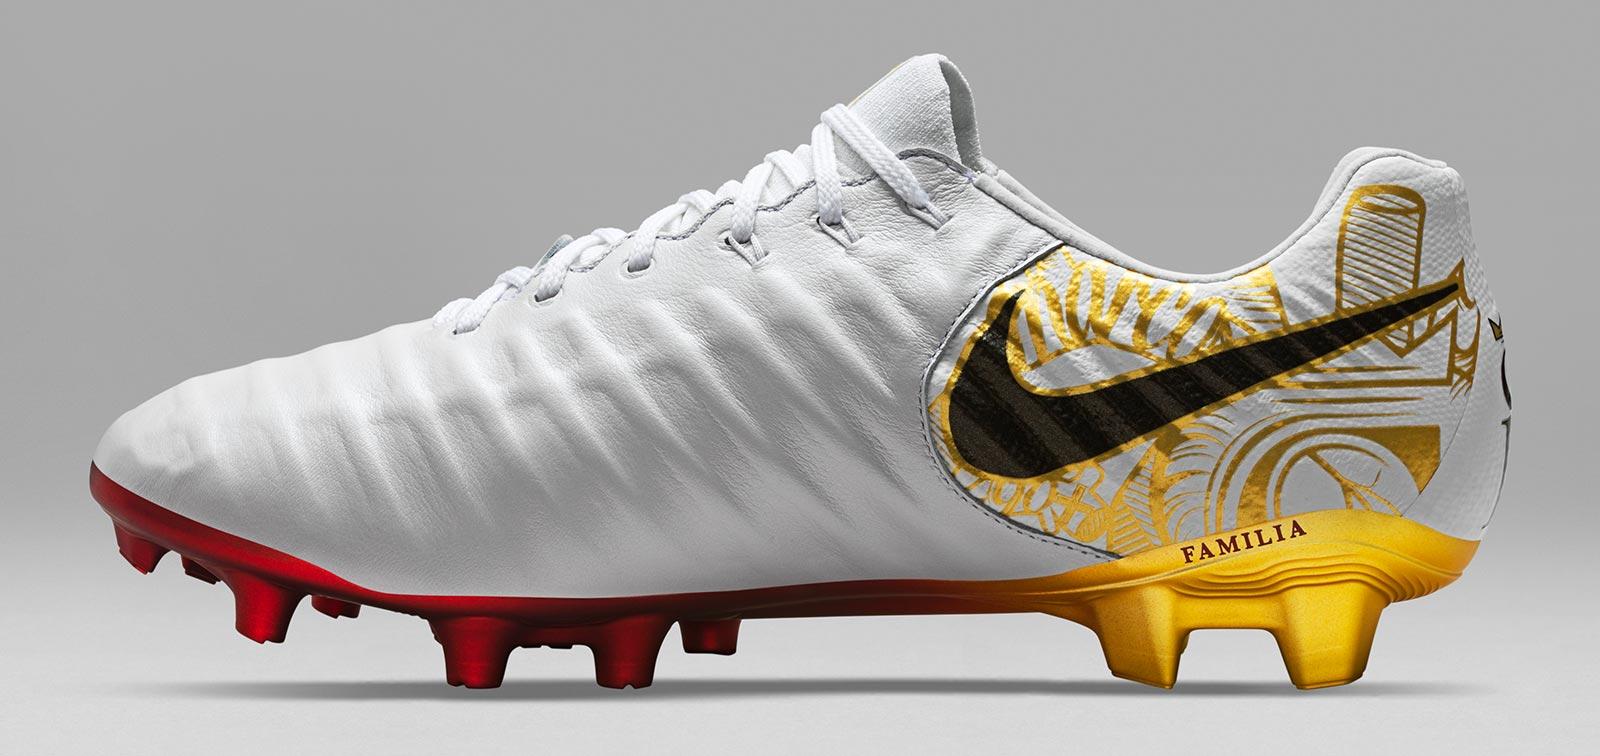 Novinky Nike Tiempo Legend VII Sergio Ramos profil 2